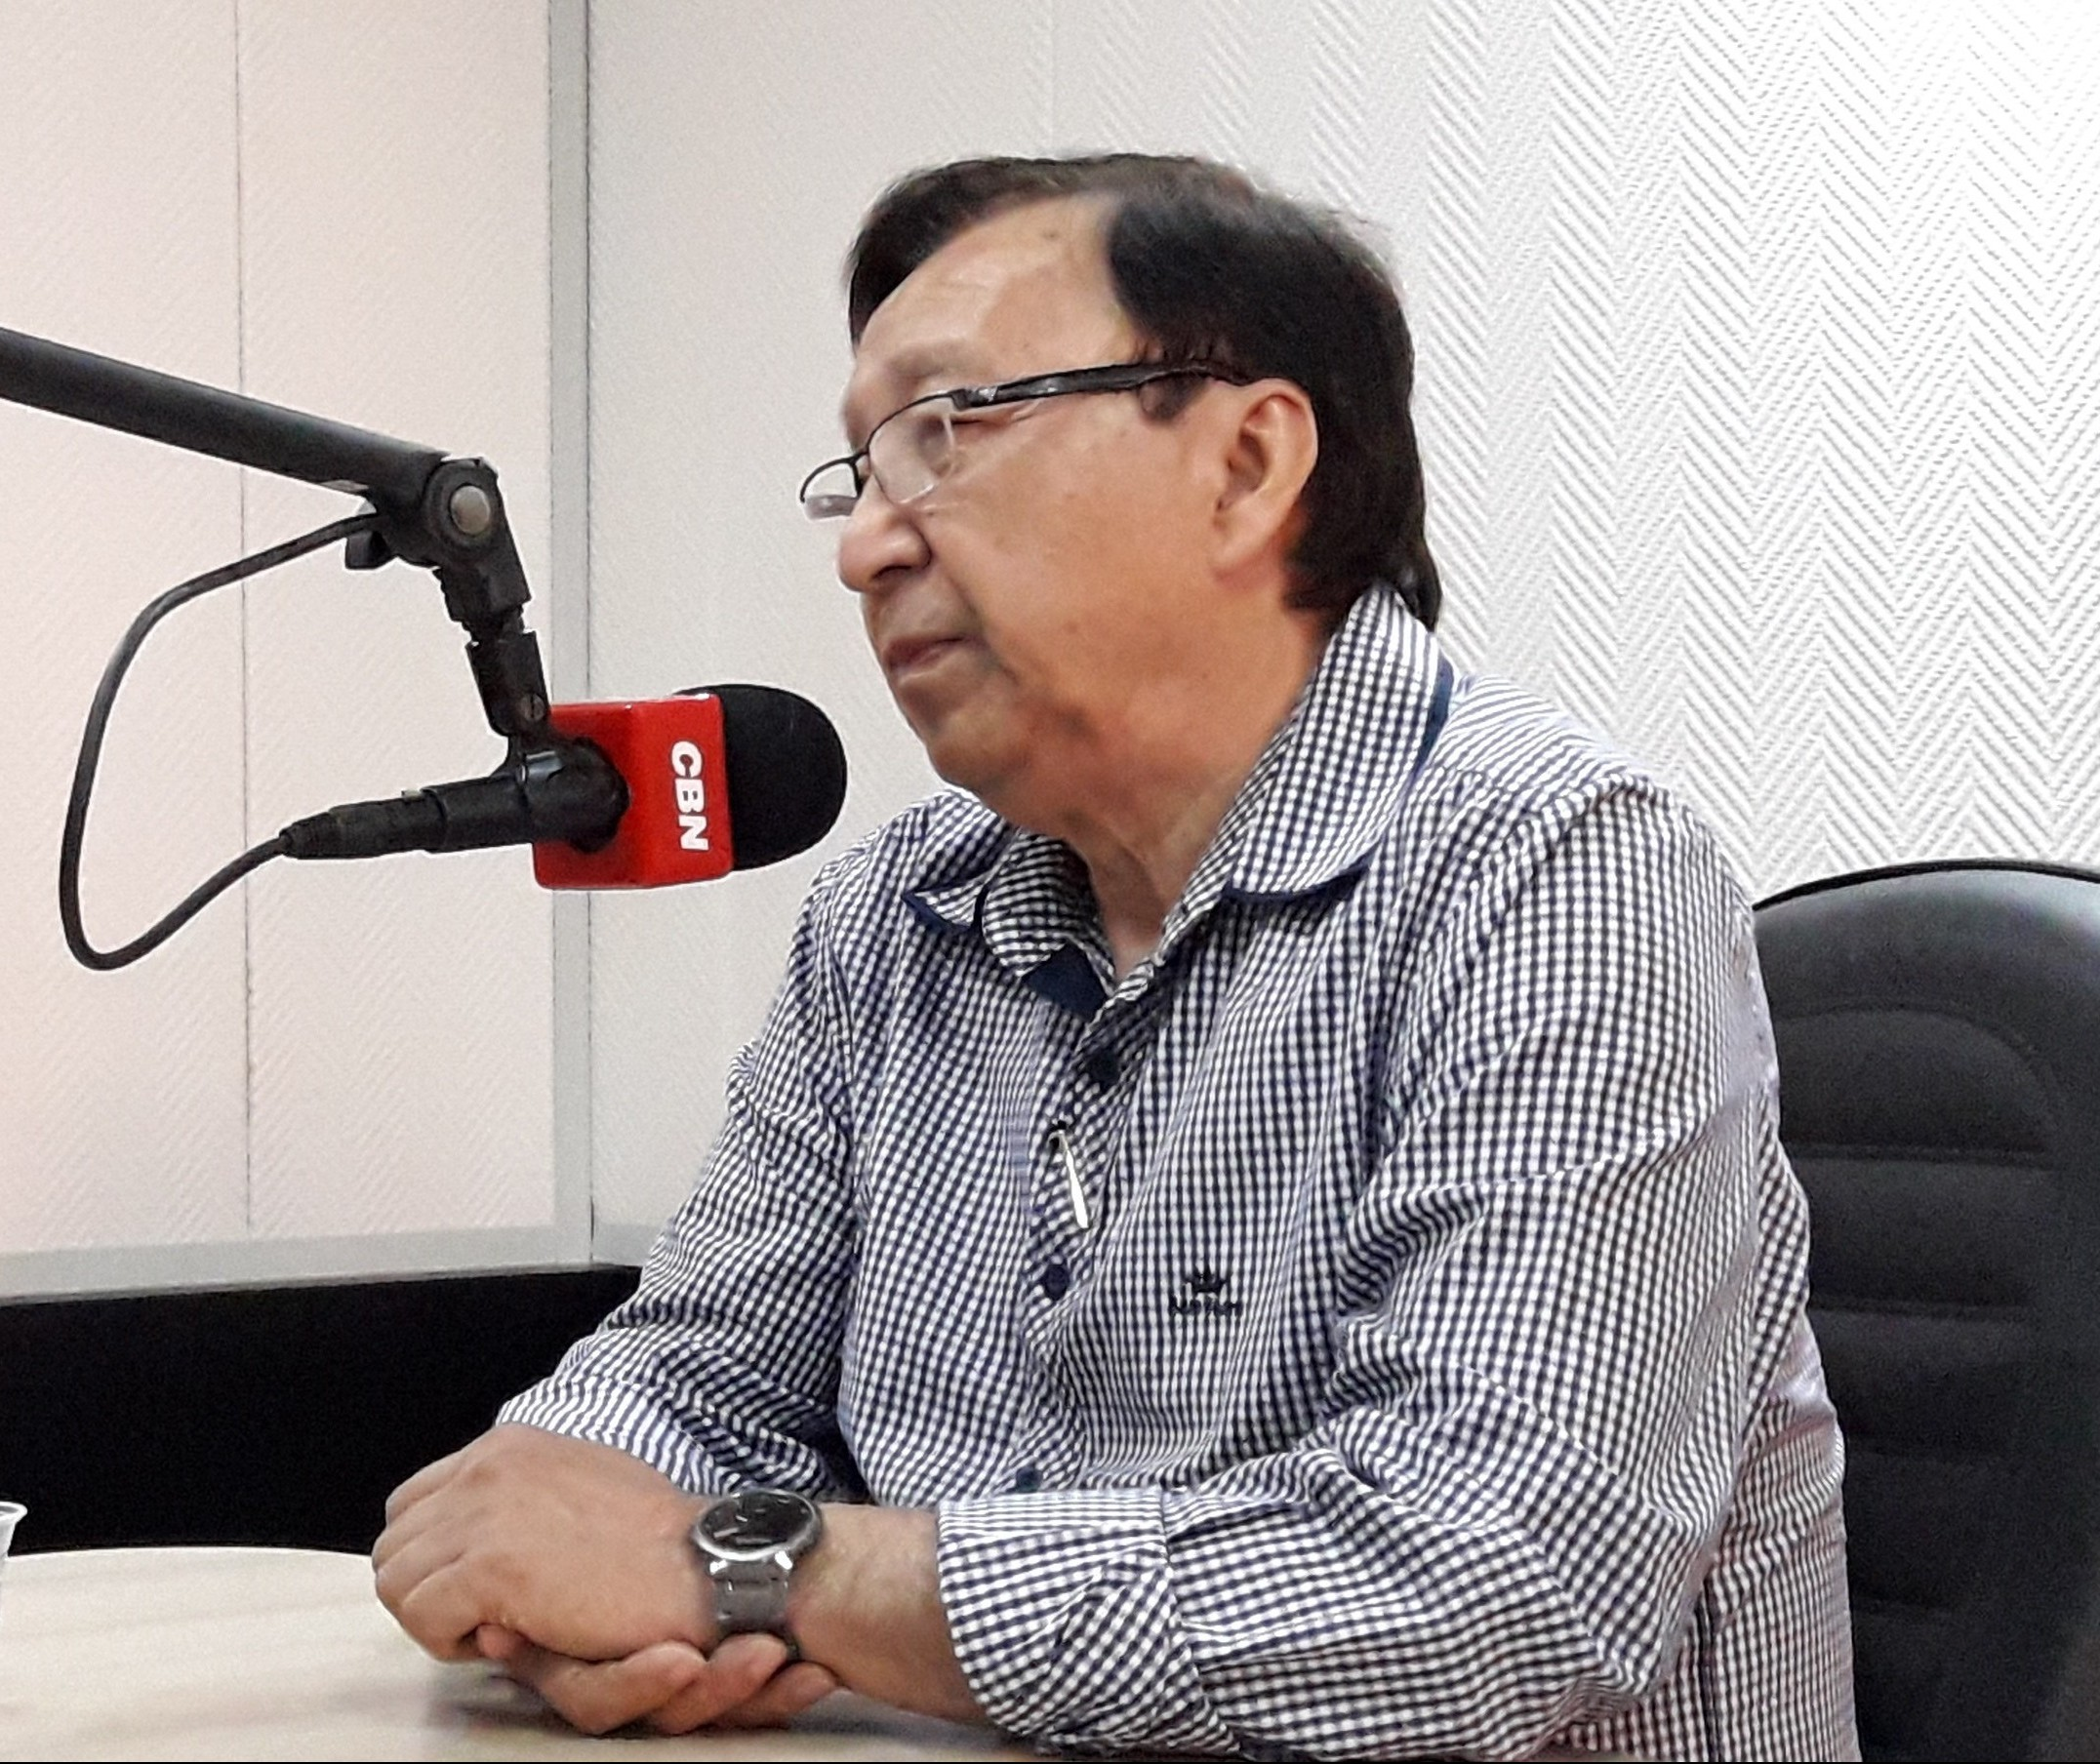 Por conta do coronavírus, Câmara de Maringá suspende presença de público